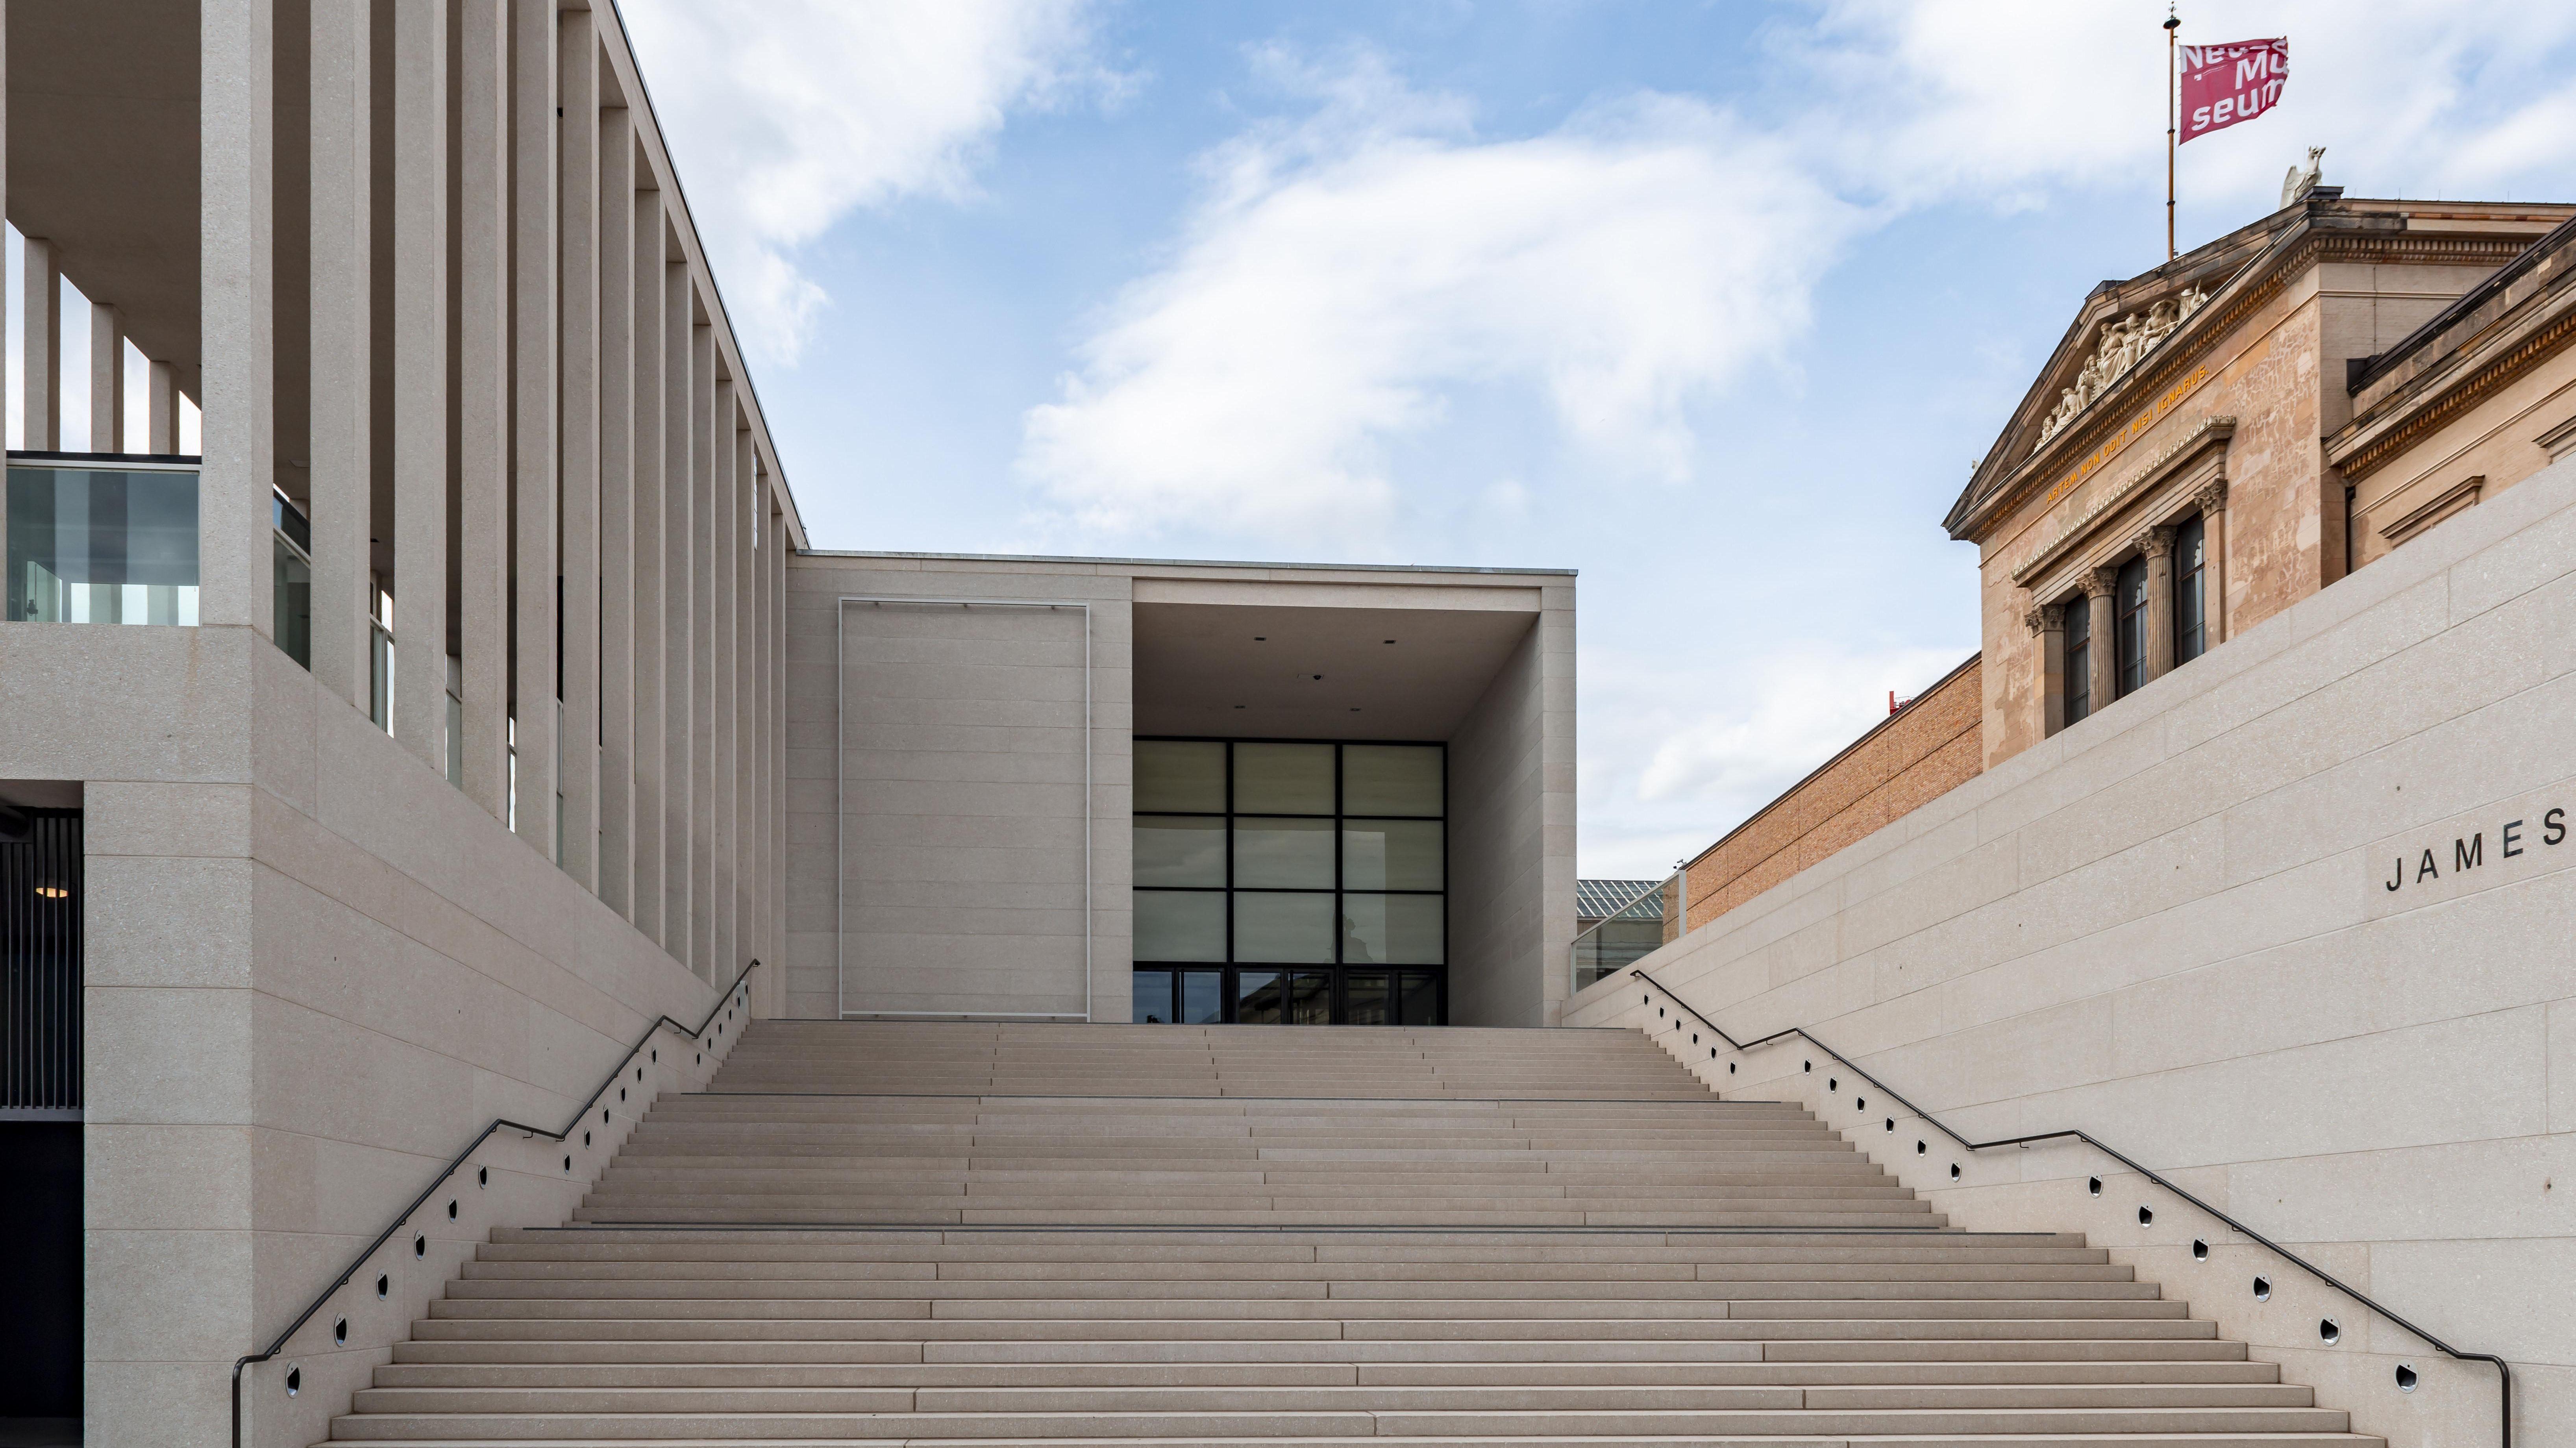 James Simon Galerie Auf der Berliner Museumsinsel